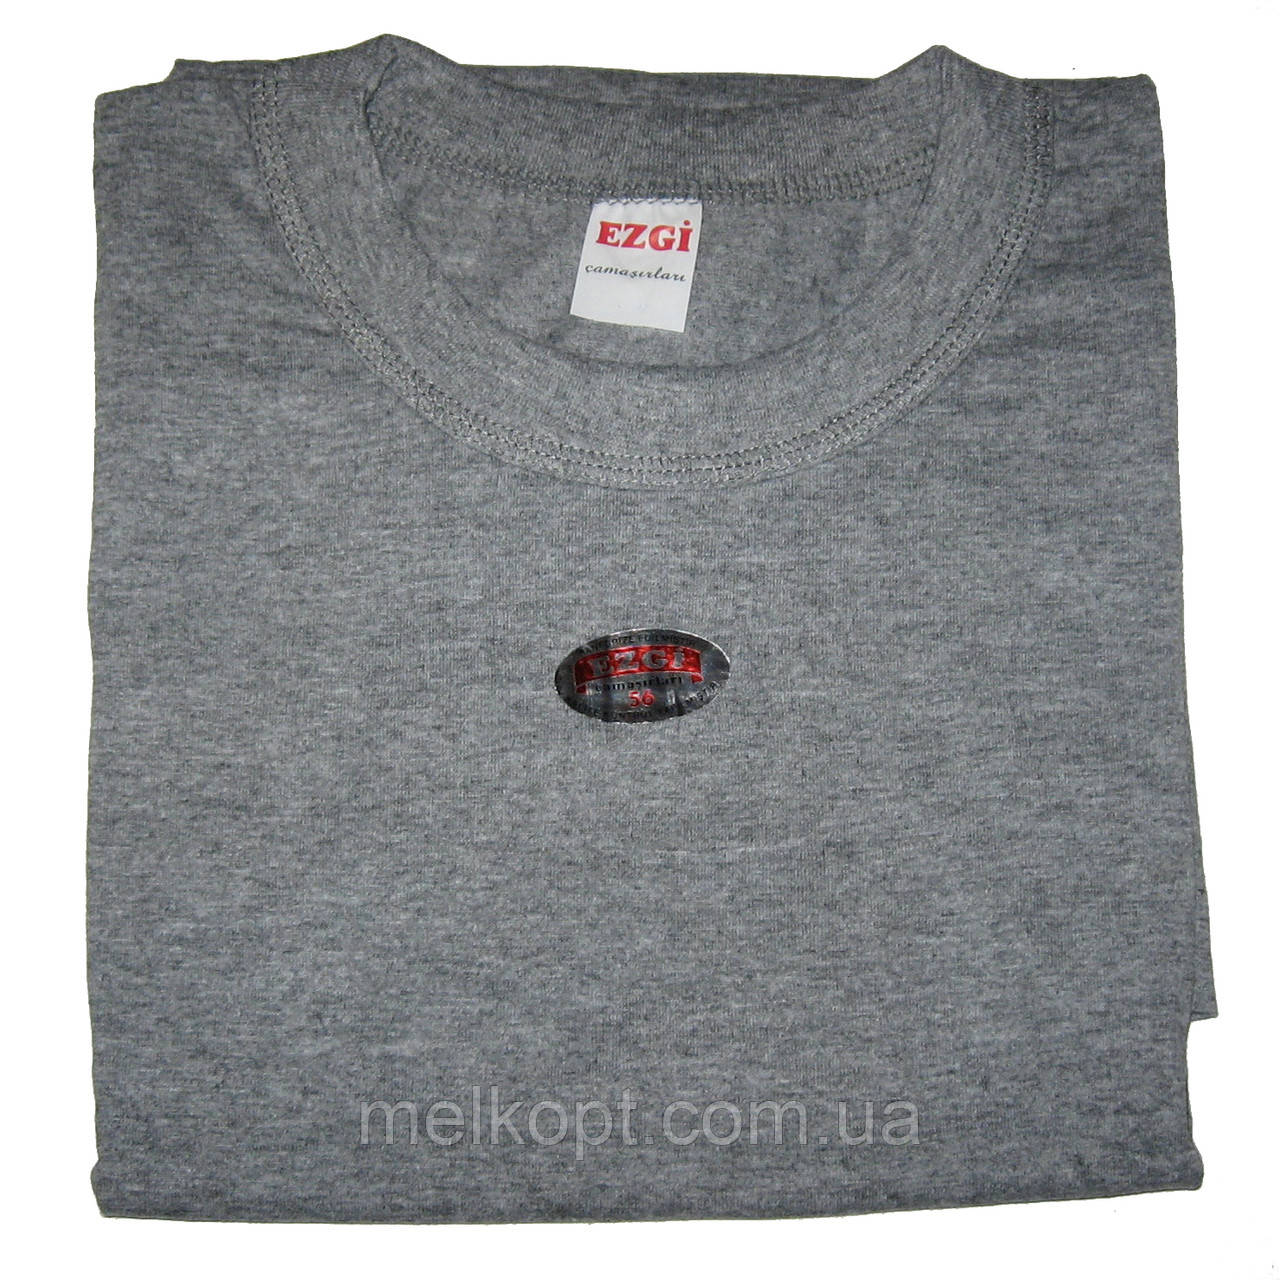 Мужские футболки Ezgi - 73,00 грн./шт. (80-й размер, серые)